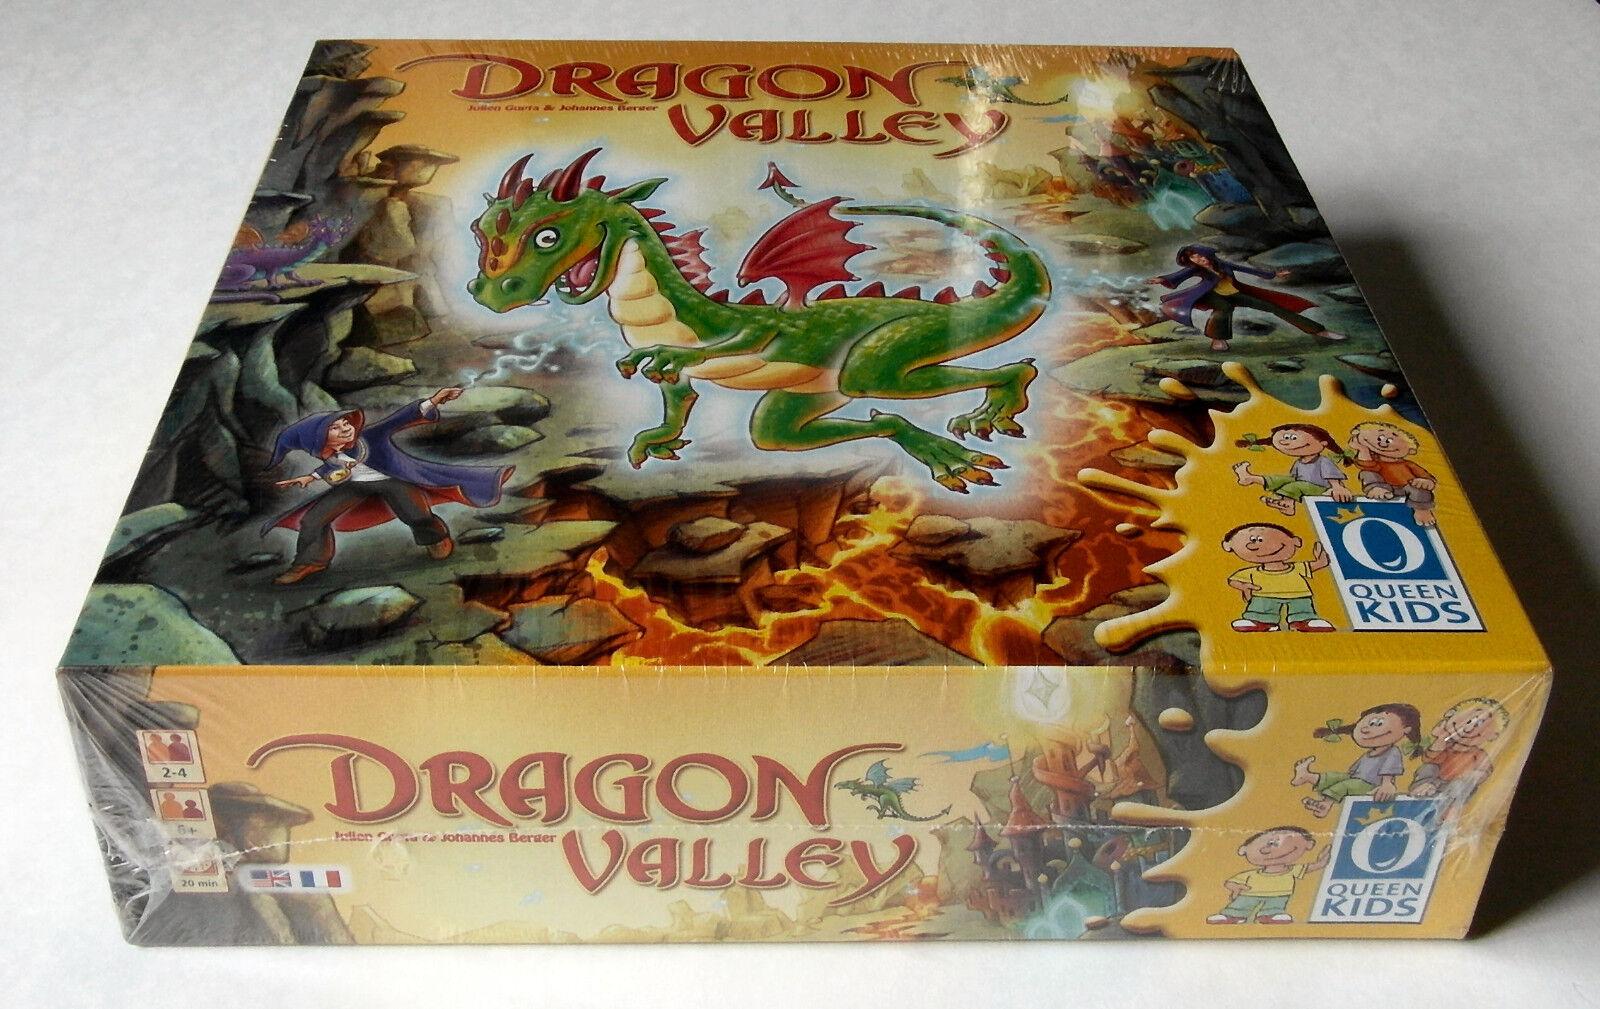 Dragon Valley - Queen Games - 2014